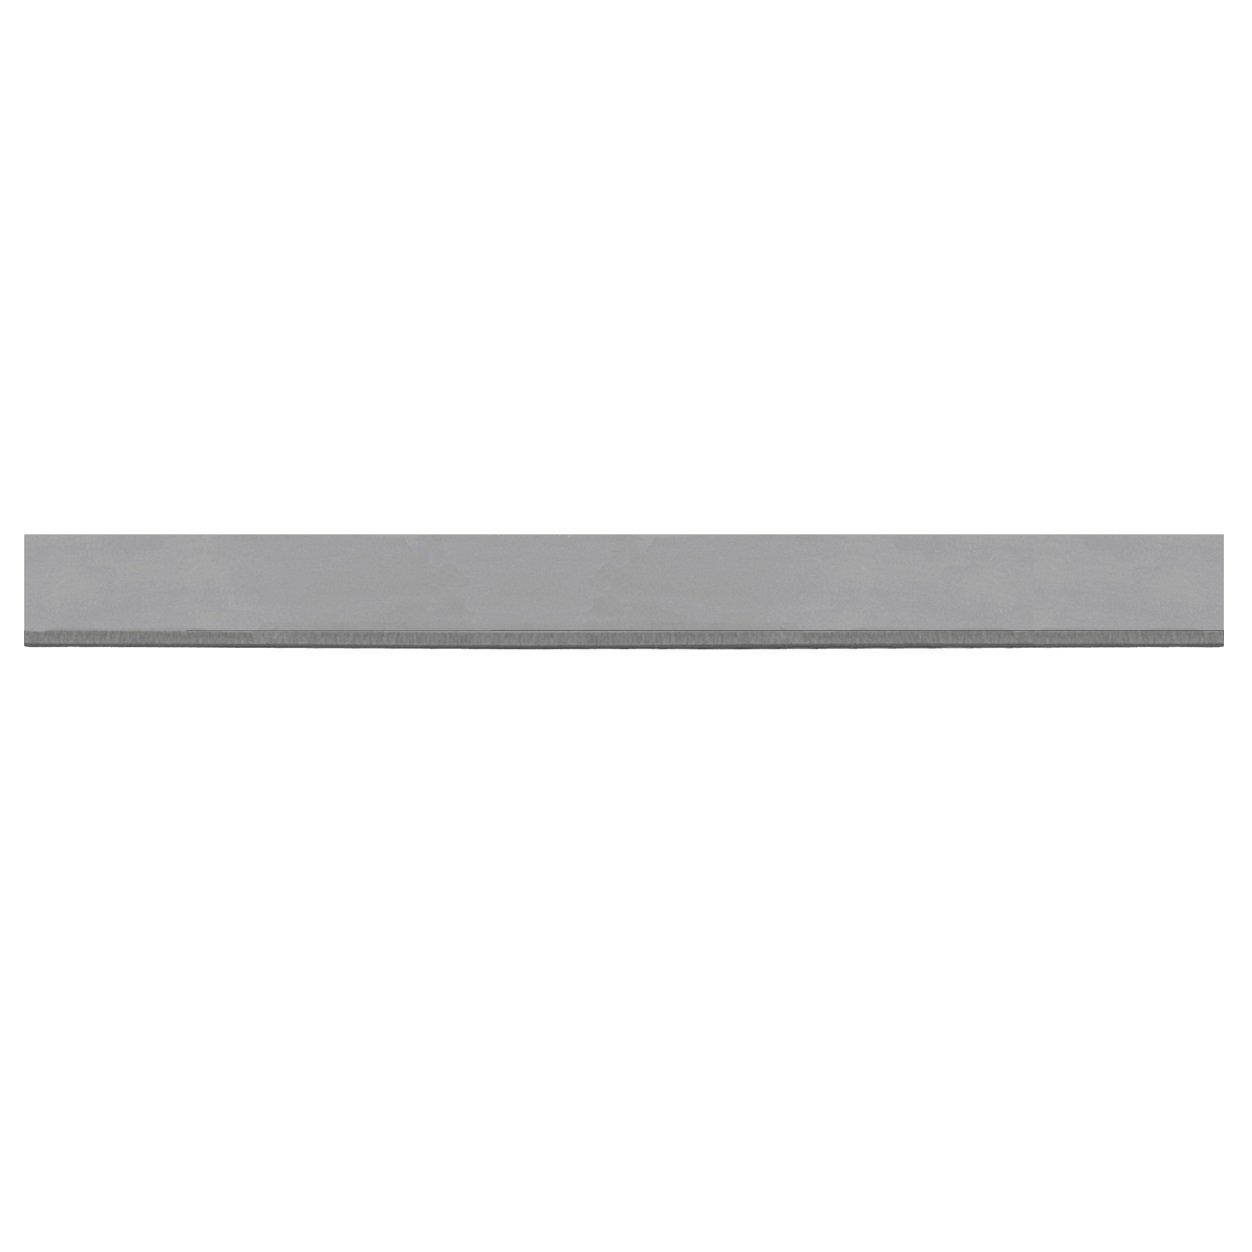 8'' Scraper Blades 50 blades per box by Better Tools (Image #1)